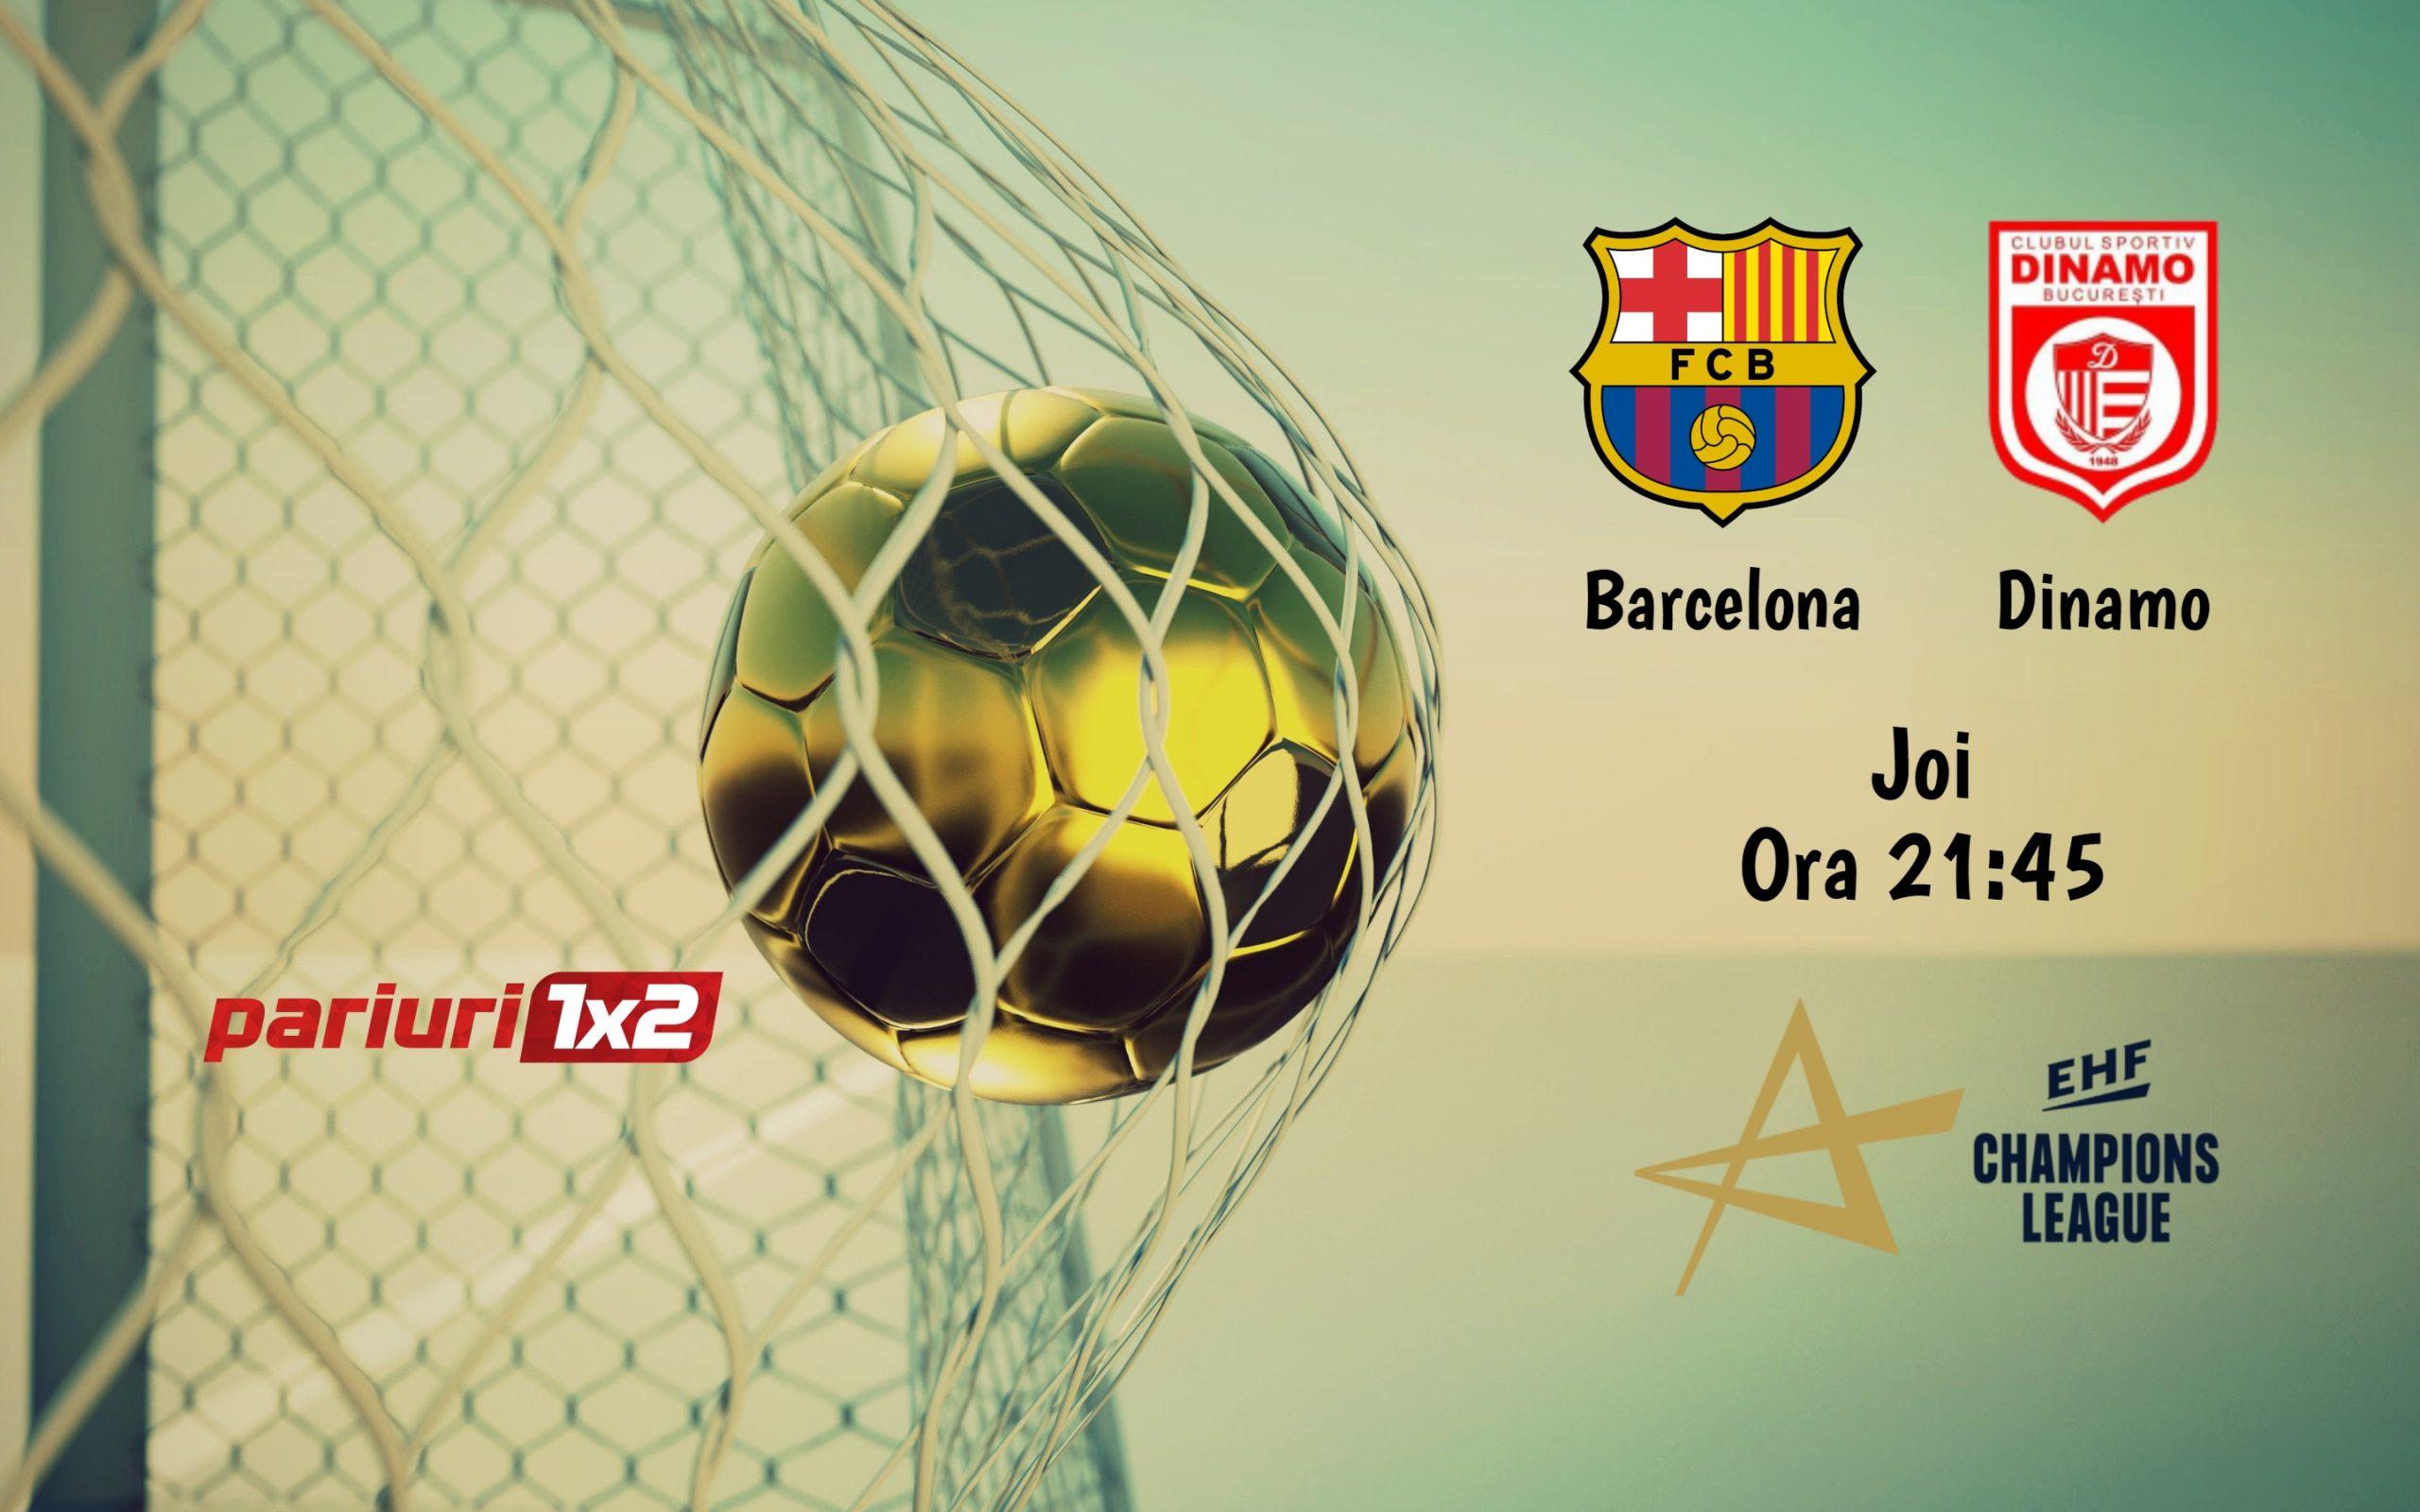 Barcelona - Dinamo